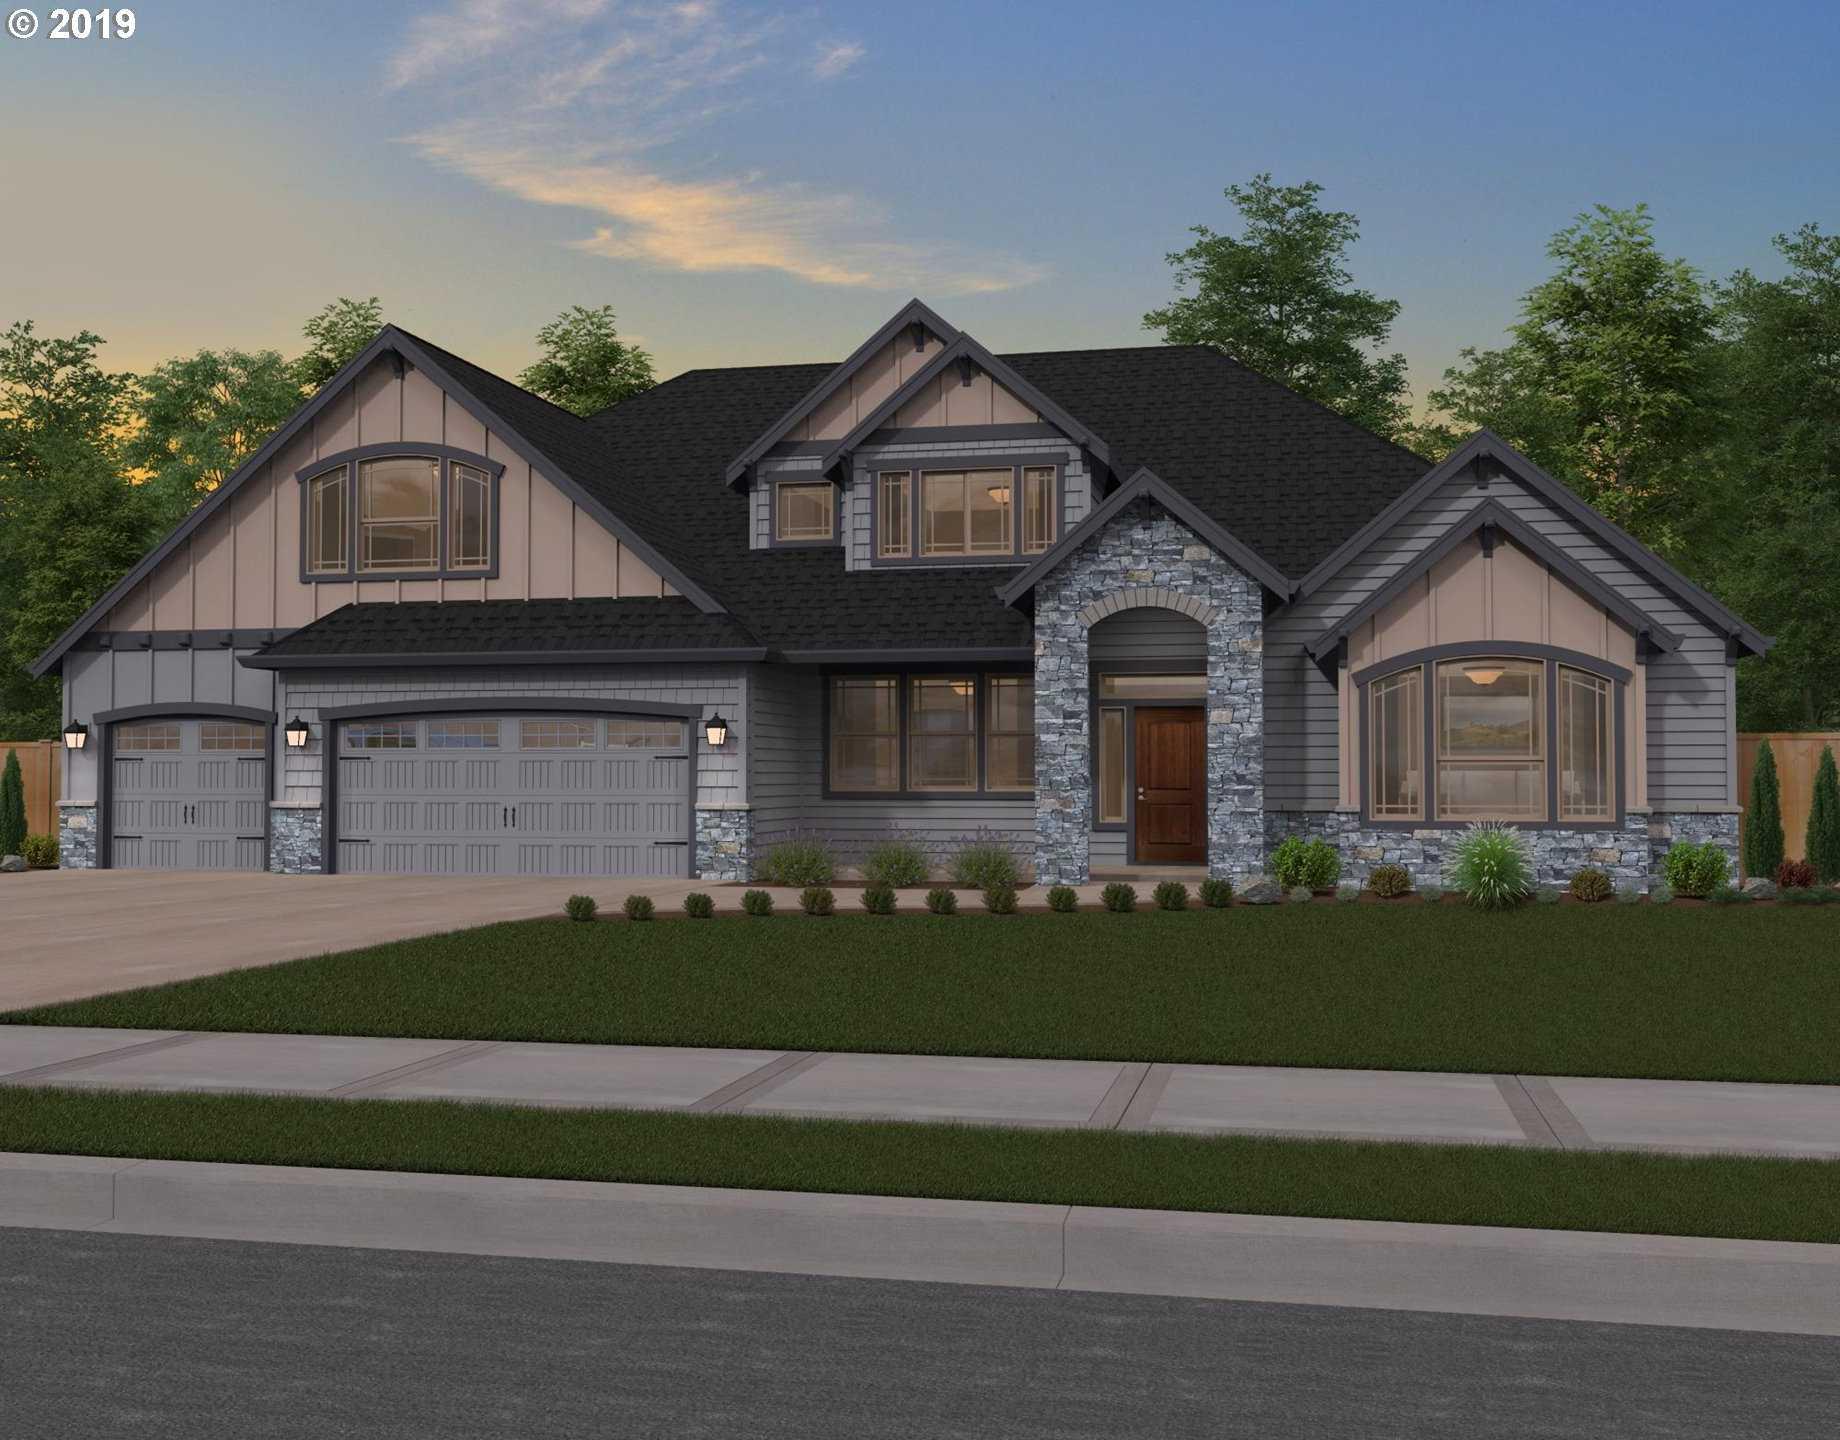 $1,100,000 - 4Br/4Ba -  for Sale in Hillsboro